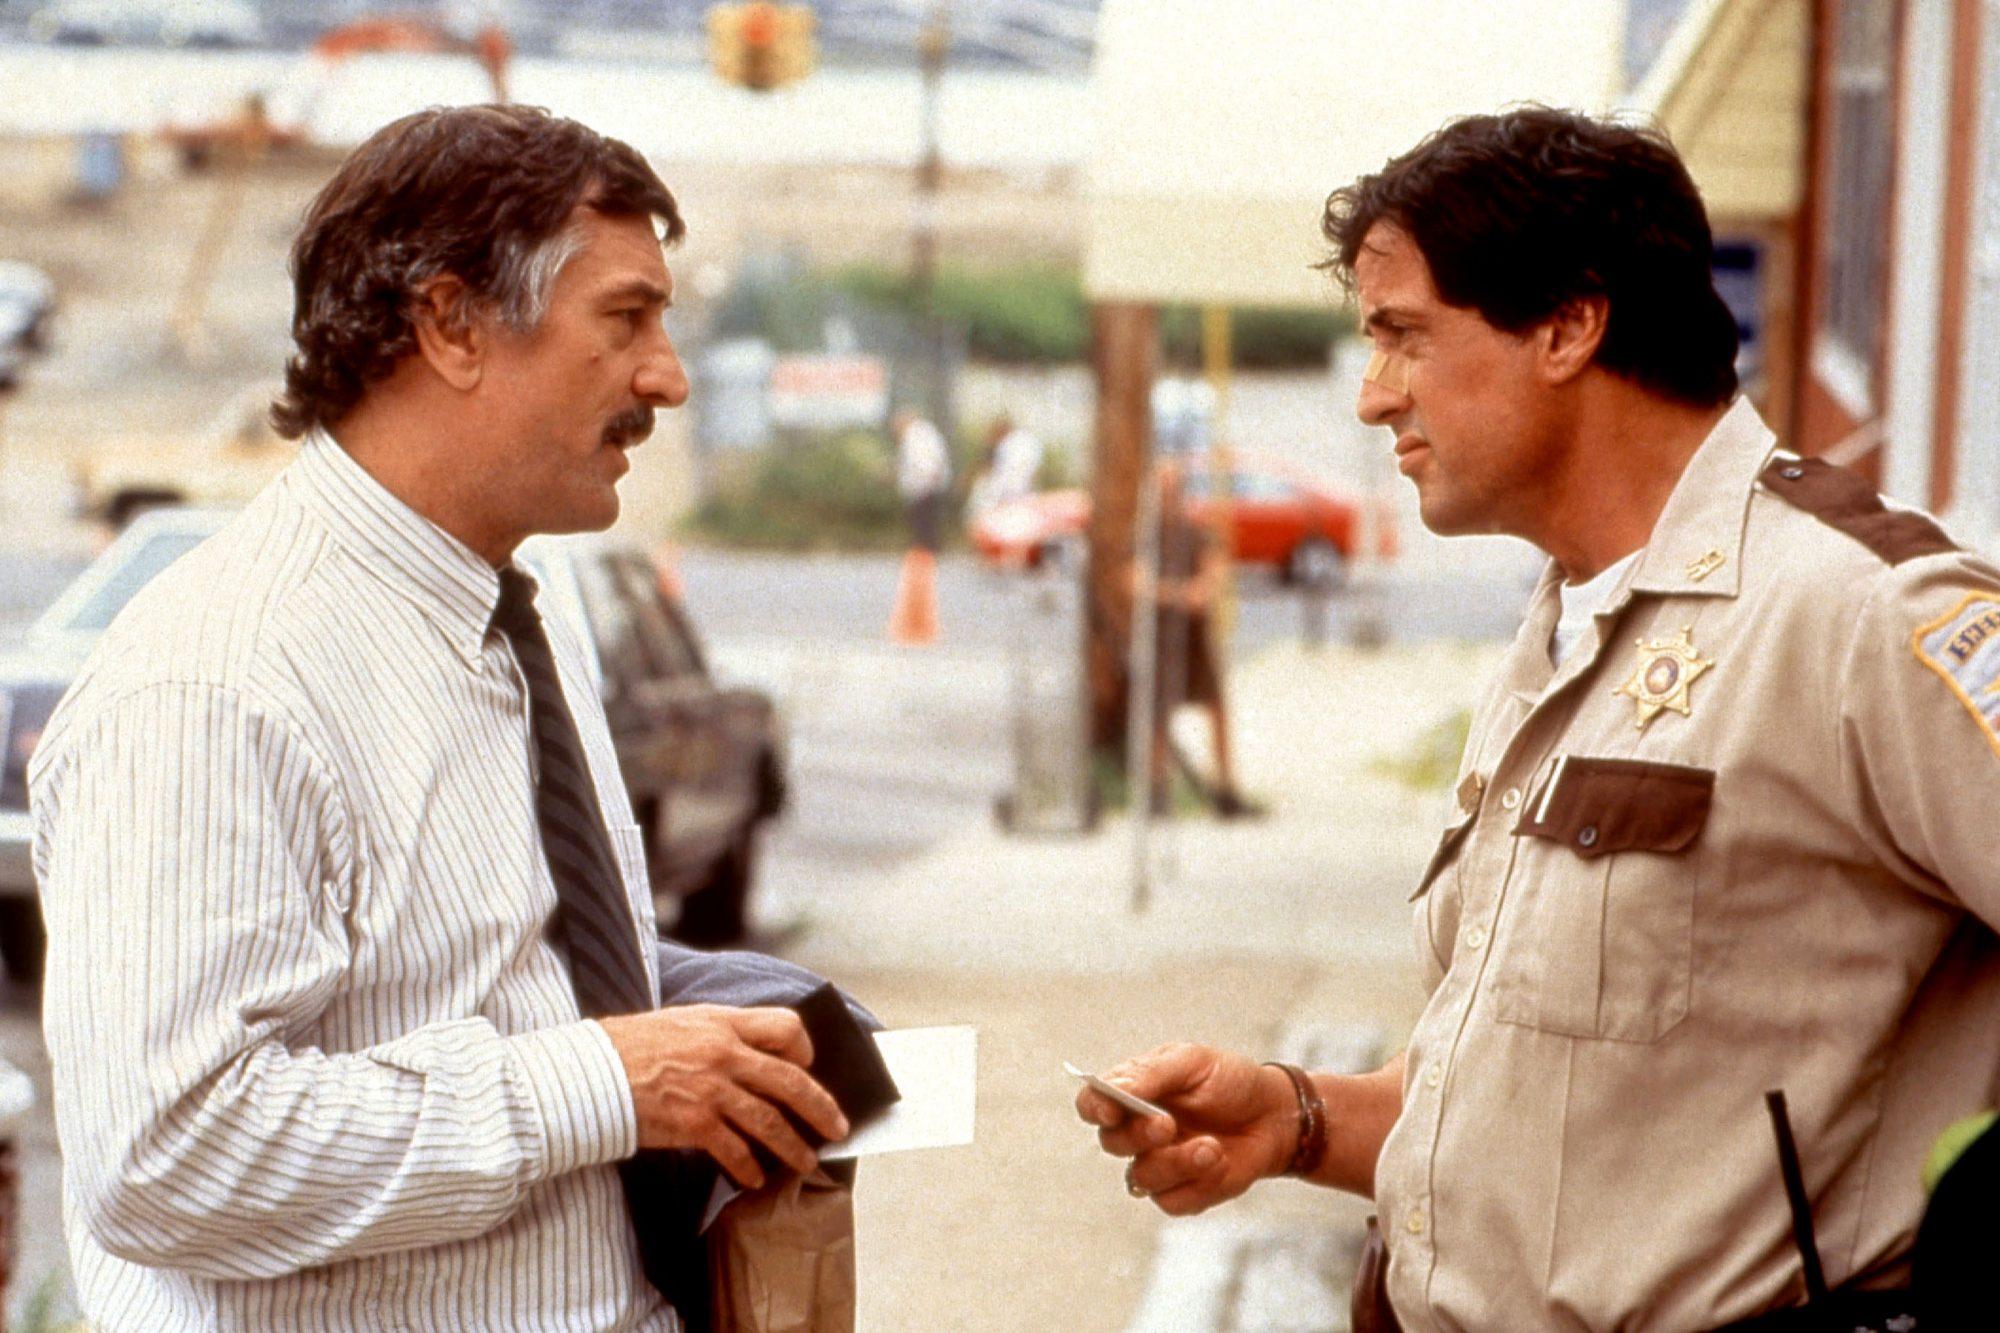 COP LAND, Robert DeNiro, Sylvester Stallone, 1997, (c)Miramax/courtesy Everett Collection